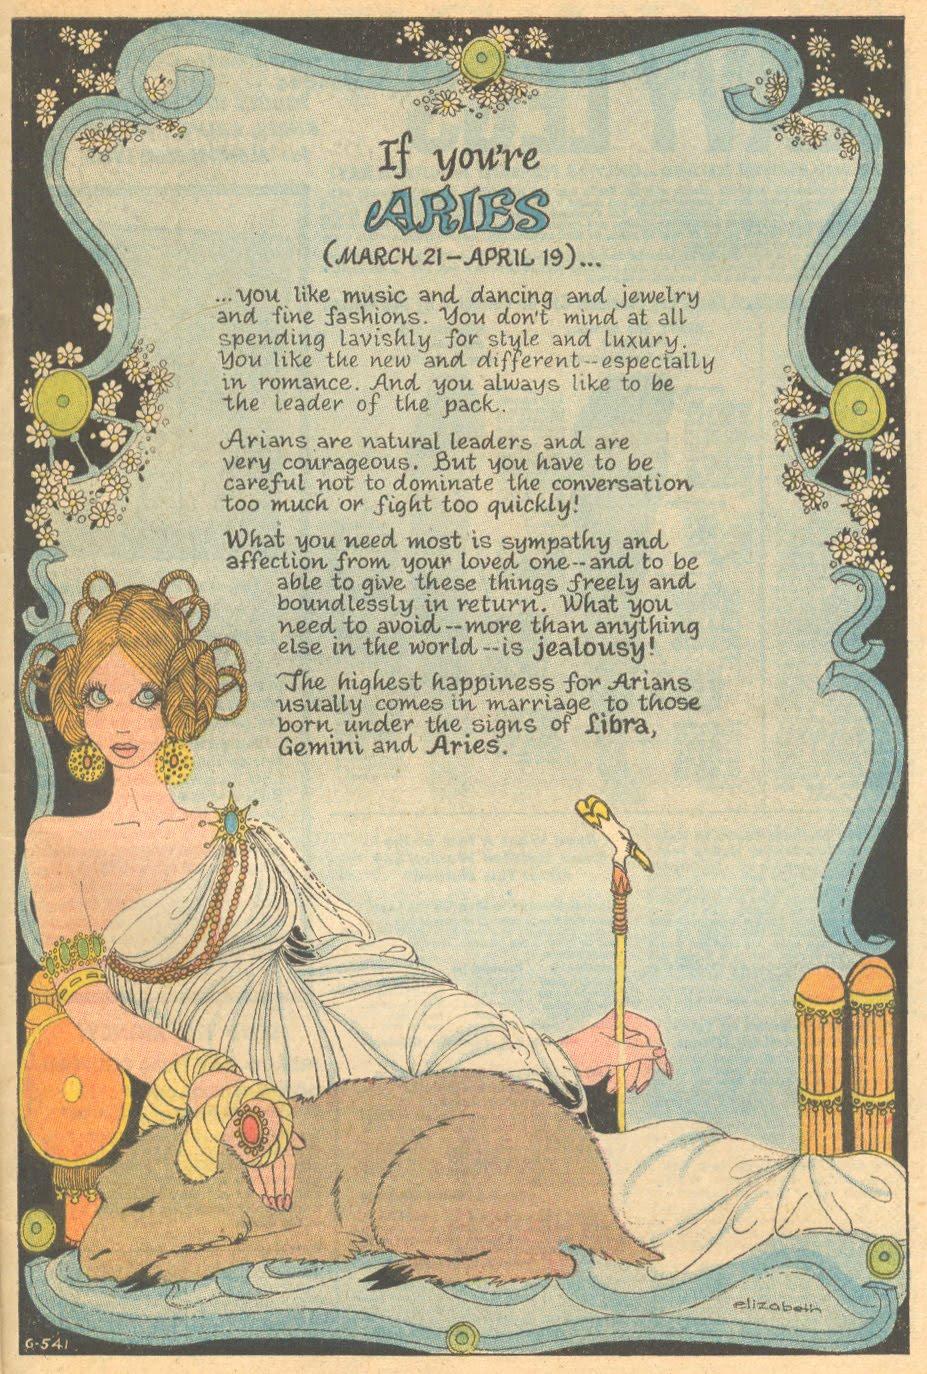 Aries Horoscope by Elizabeth  Secret Hearts  #143 (April 1970)